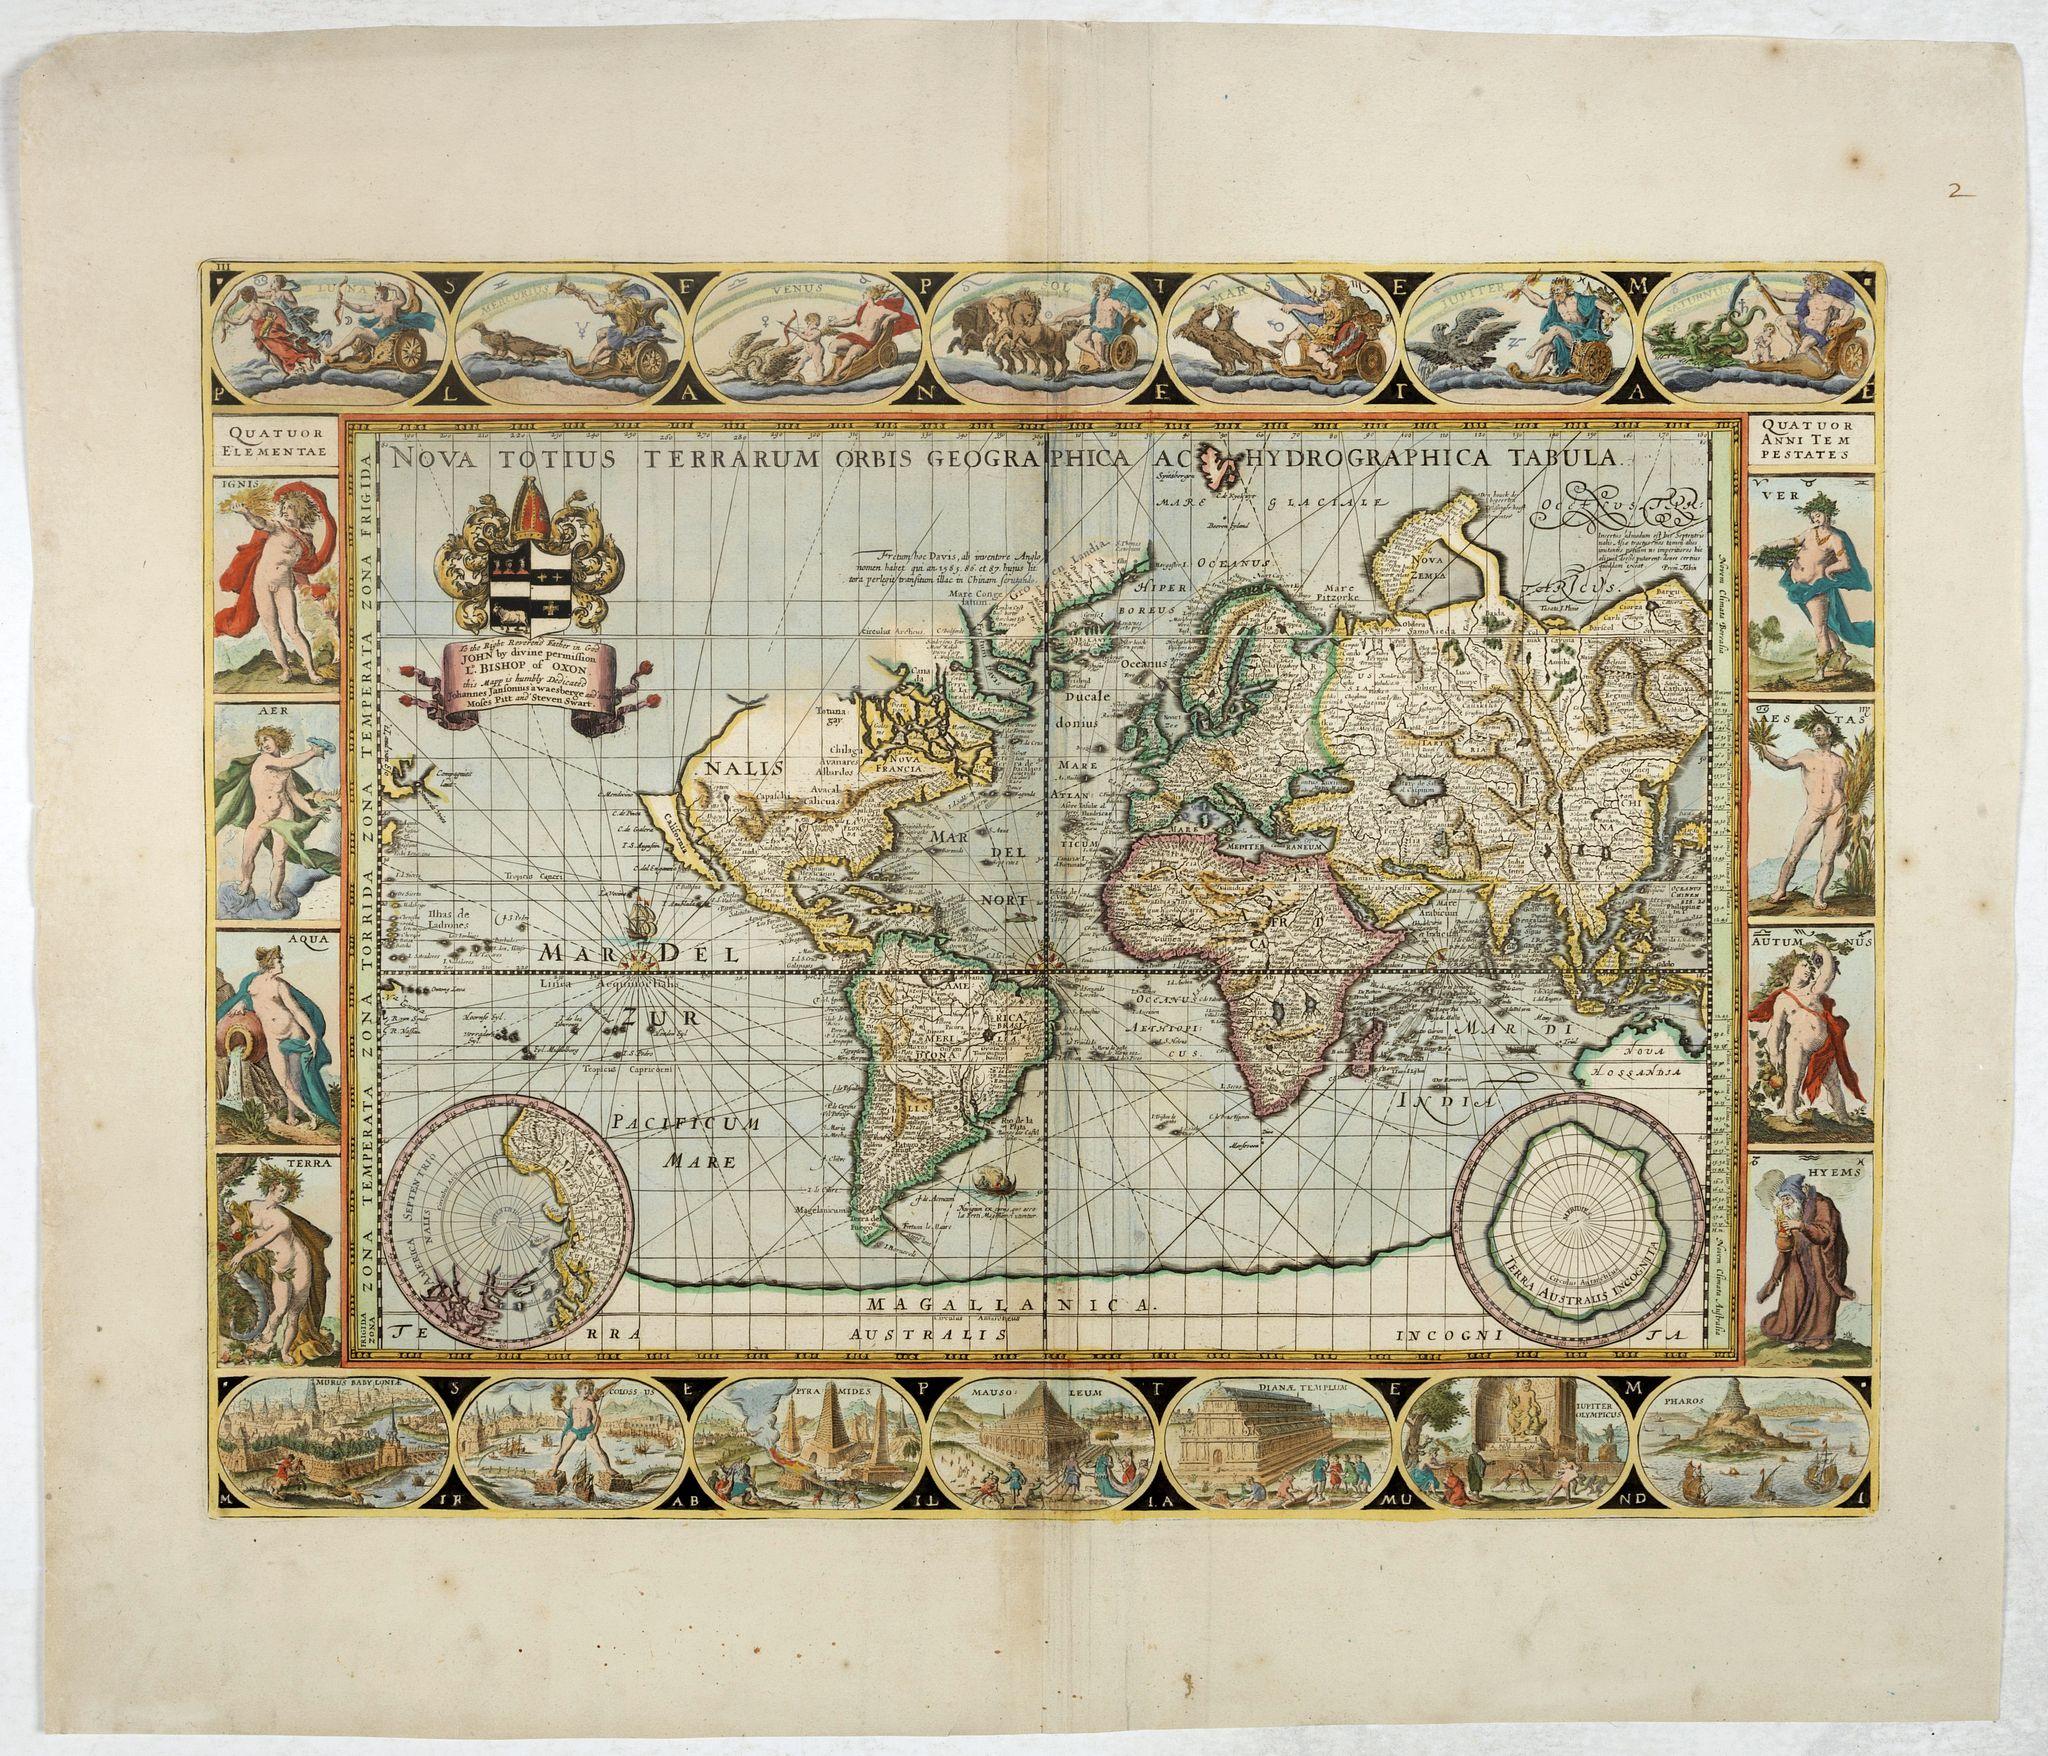 PITT, M. / SWART, S. / JANSSONIUS VAN WAESBERGHE,  -  Nova Totius Terrarum Orbis Geographica ac Hydrographica Tabula.